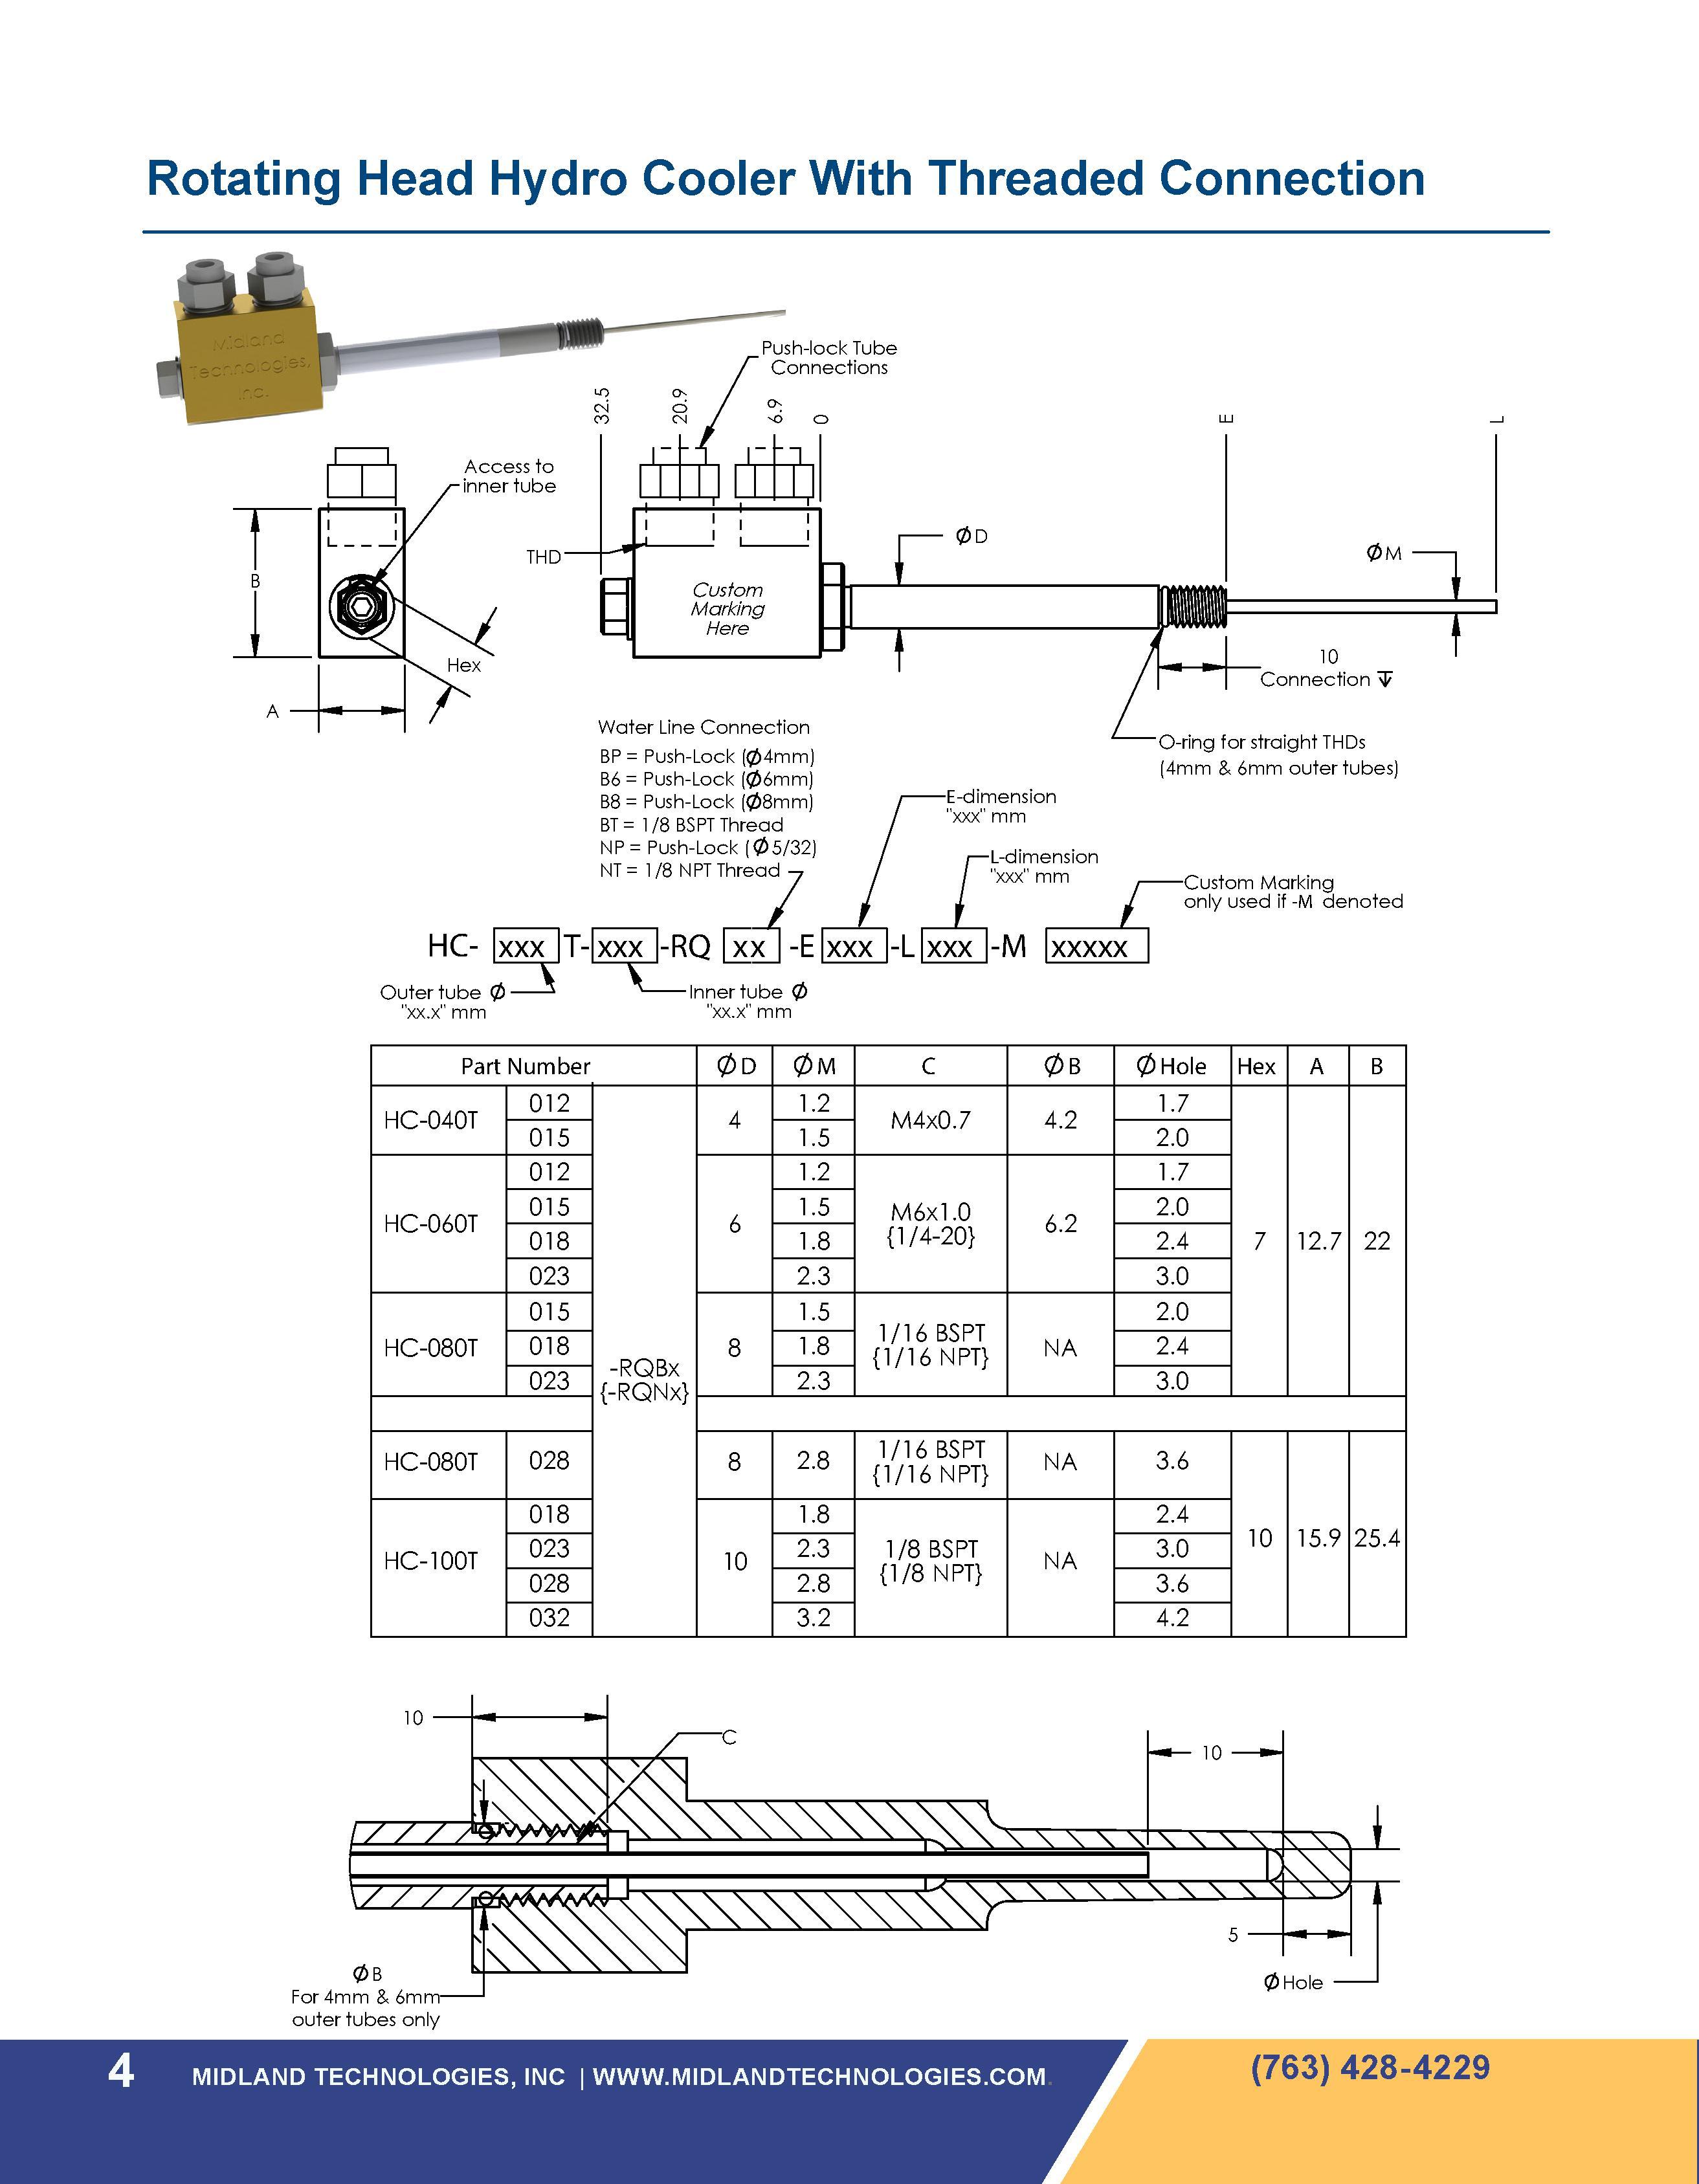 High Velocity Hydro Coolers – Midland Technologies, Inc